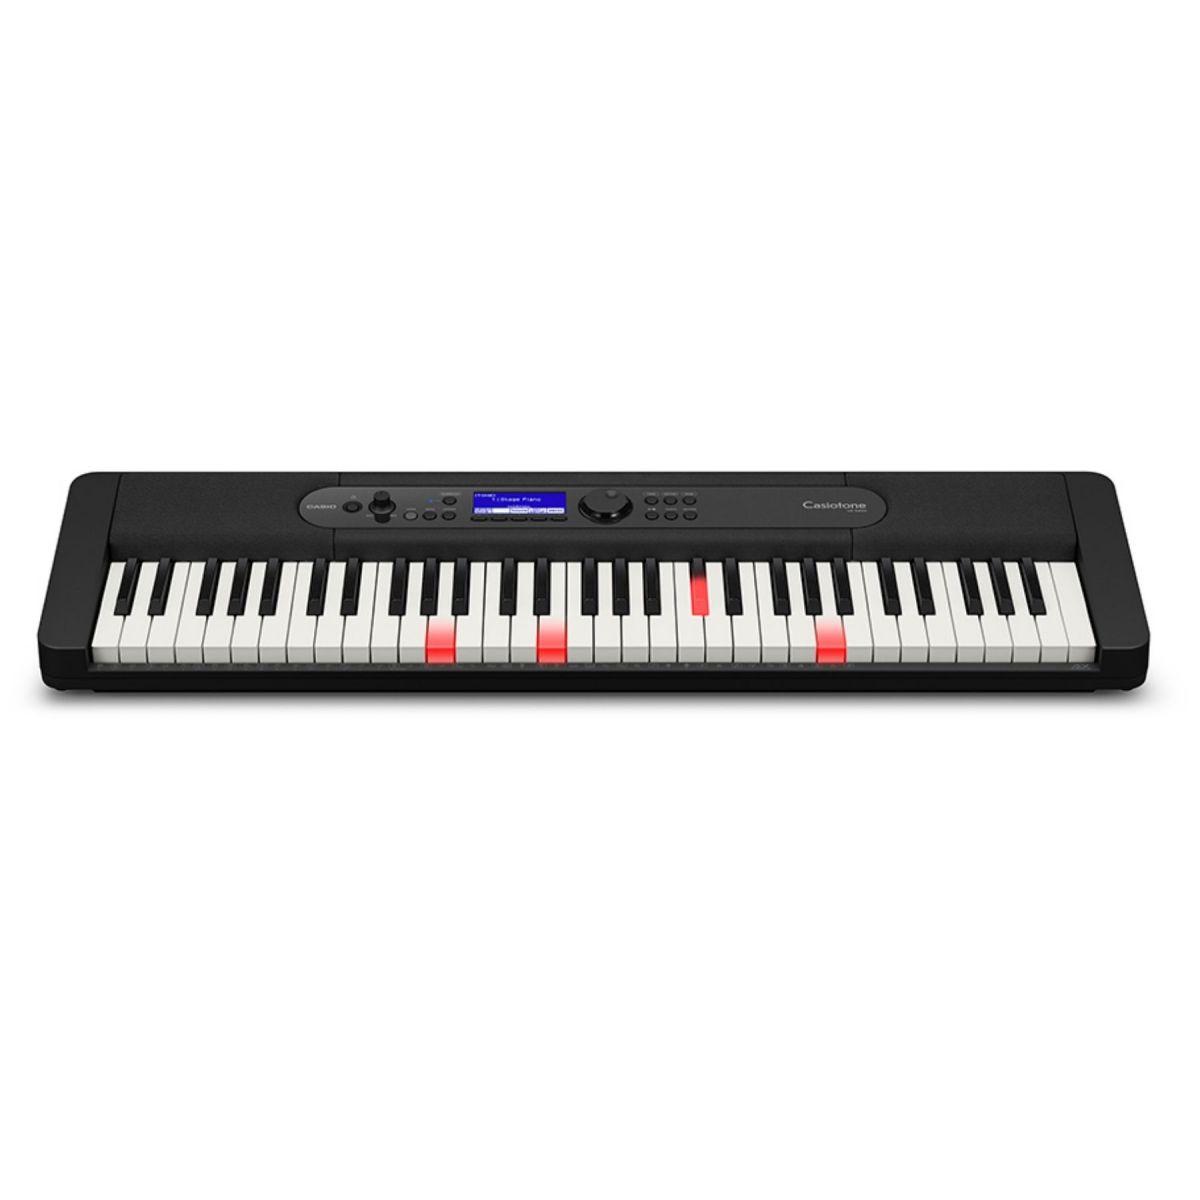 Tastiera Arranger Casio LK-S450 Casiotone 61 tasti black